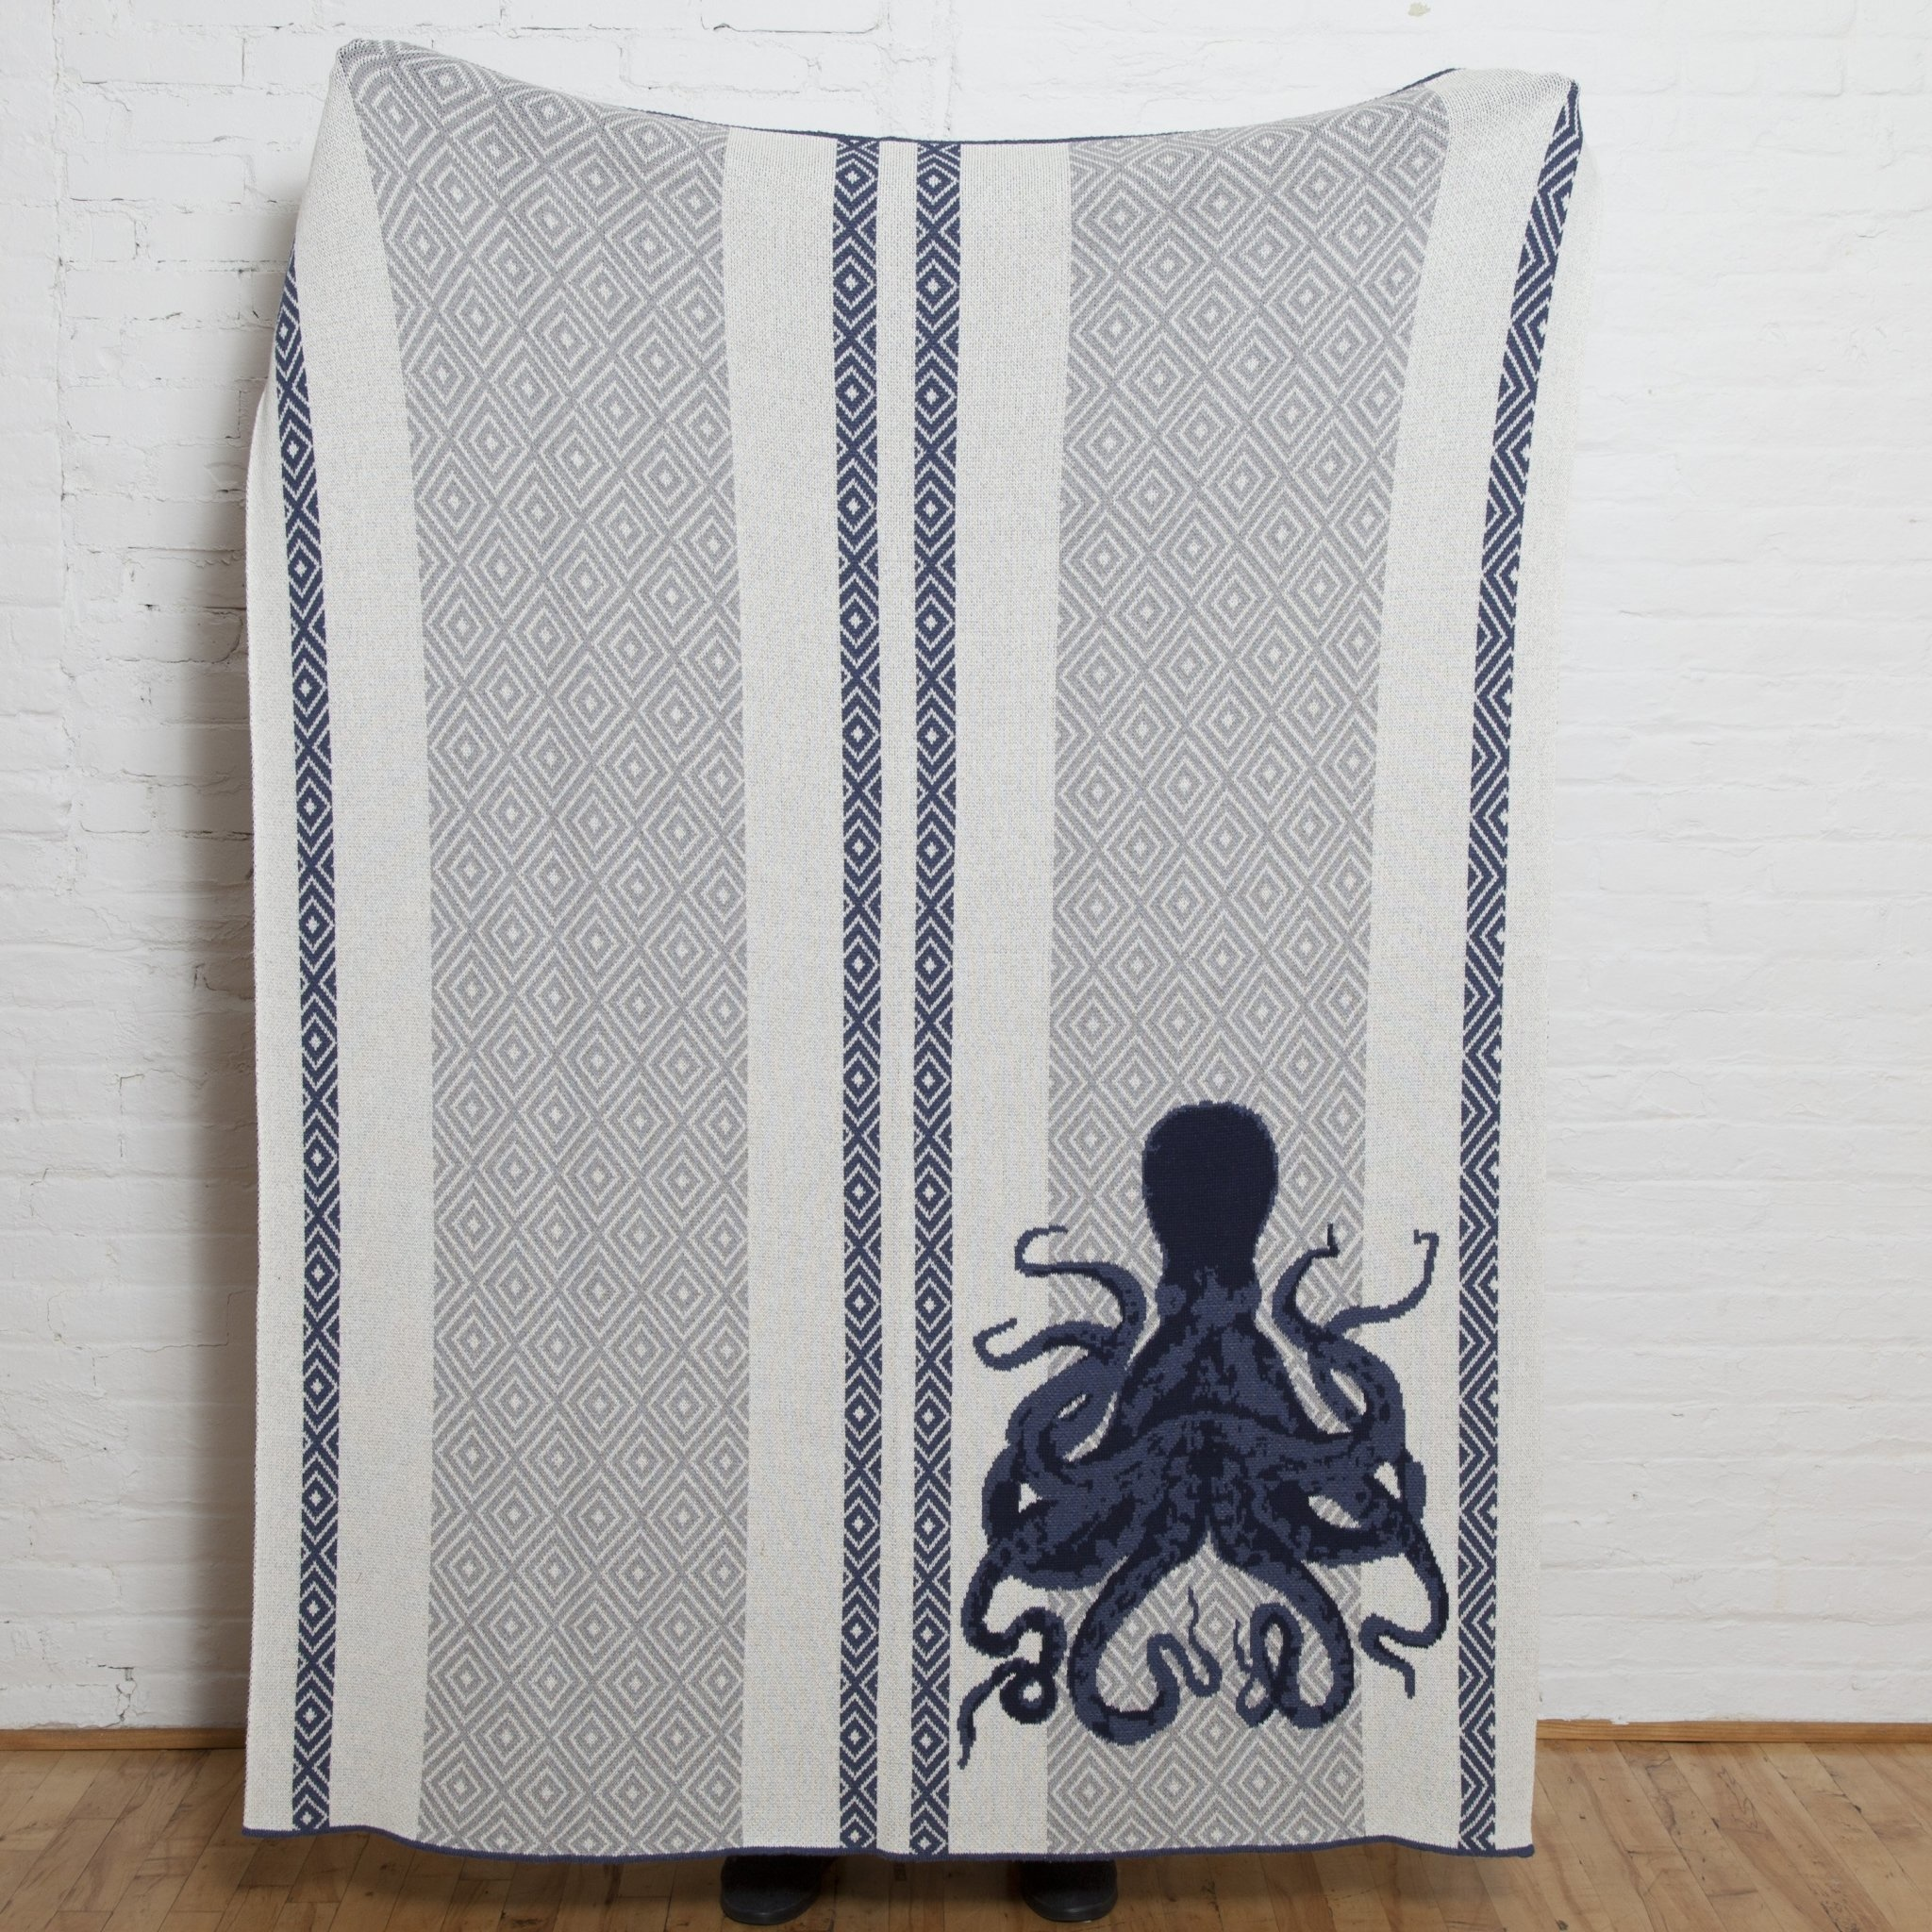 Octopus Square Milk/Alum/Slate/Marine